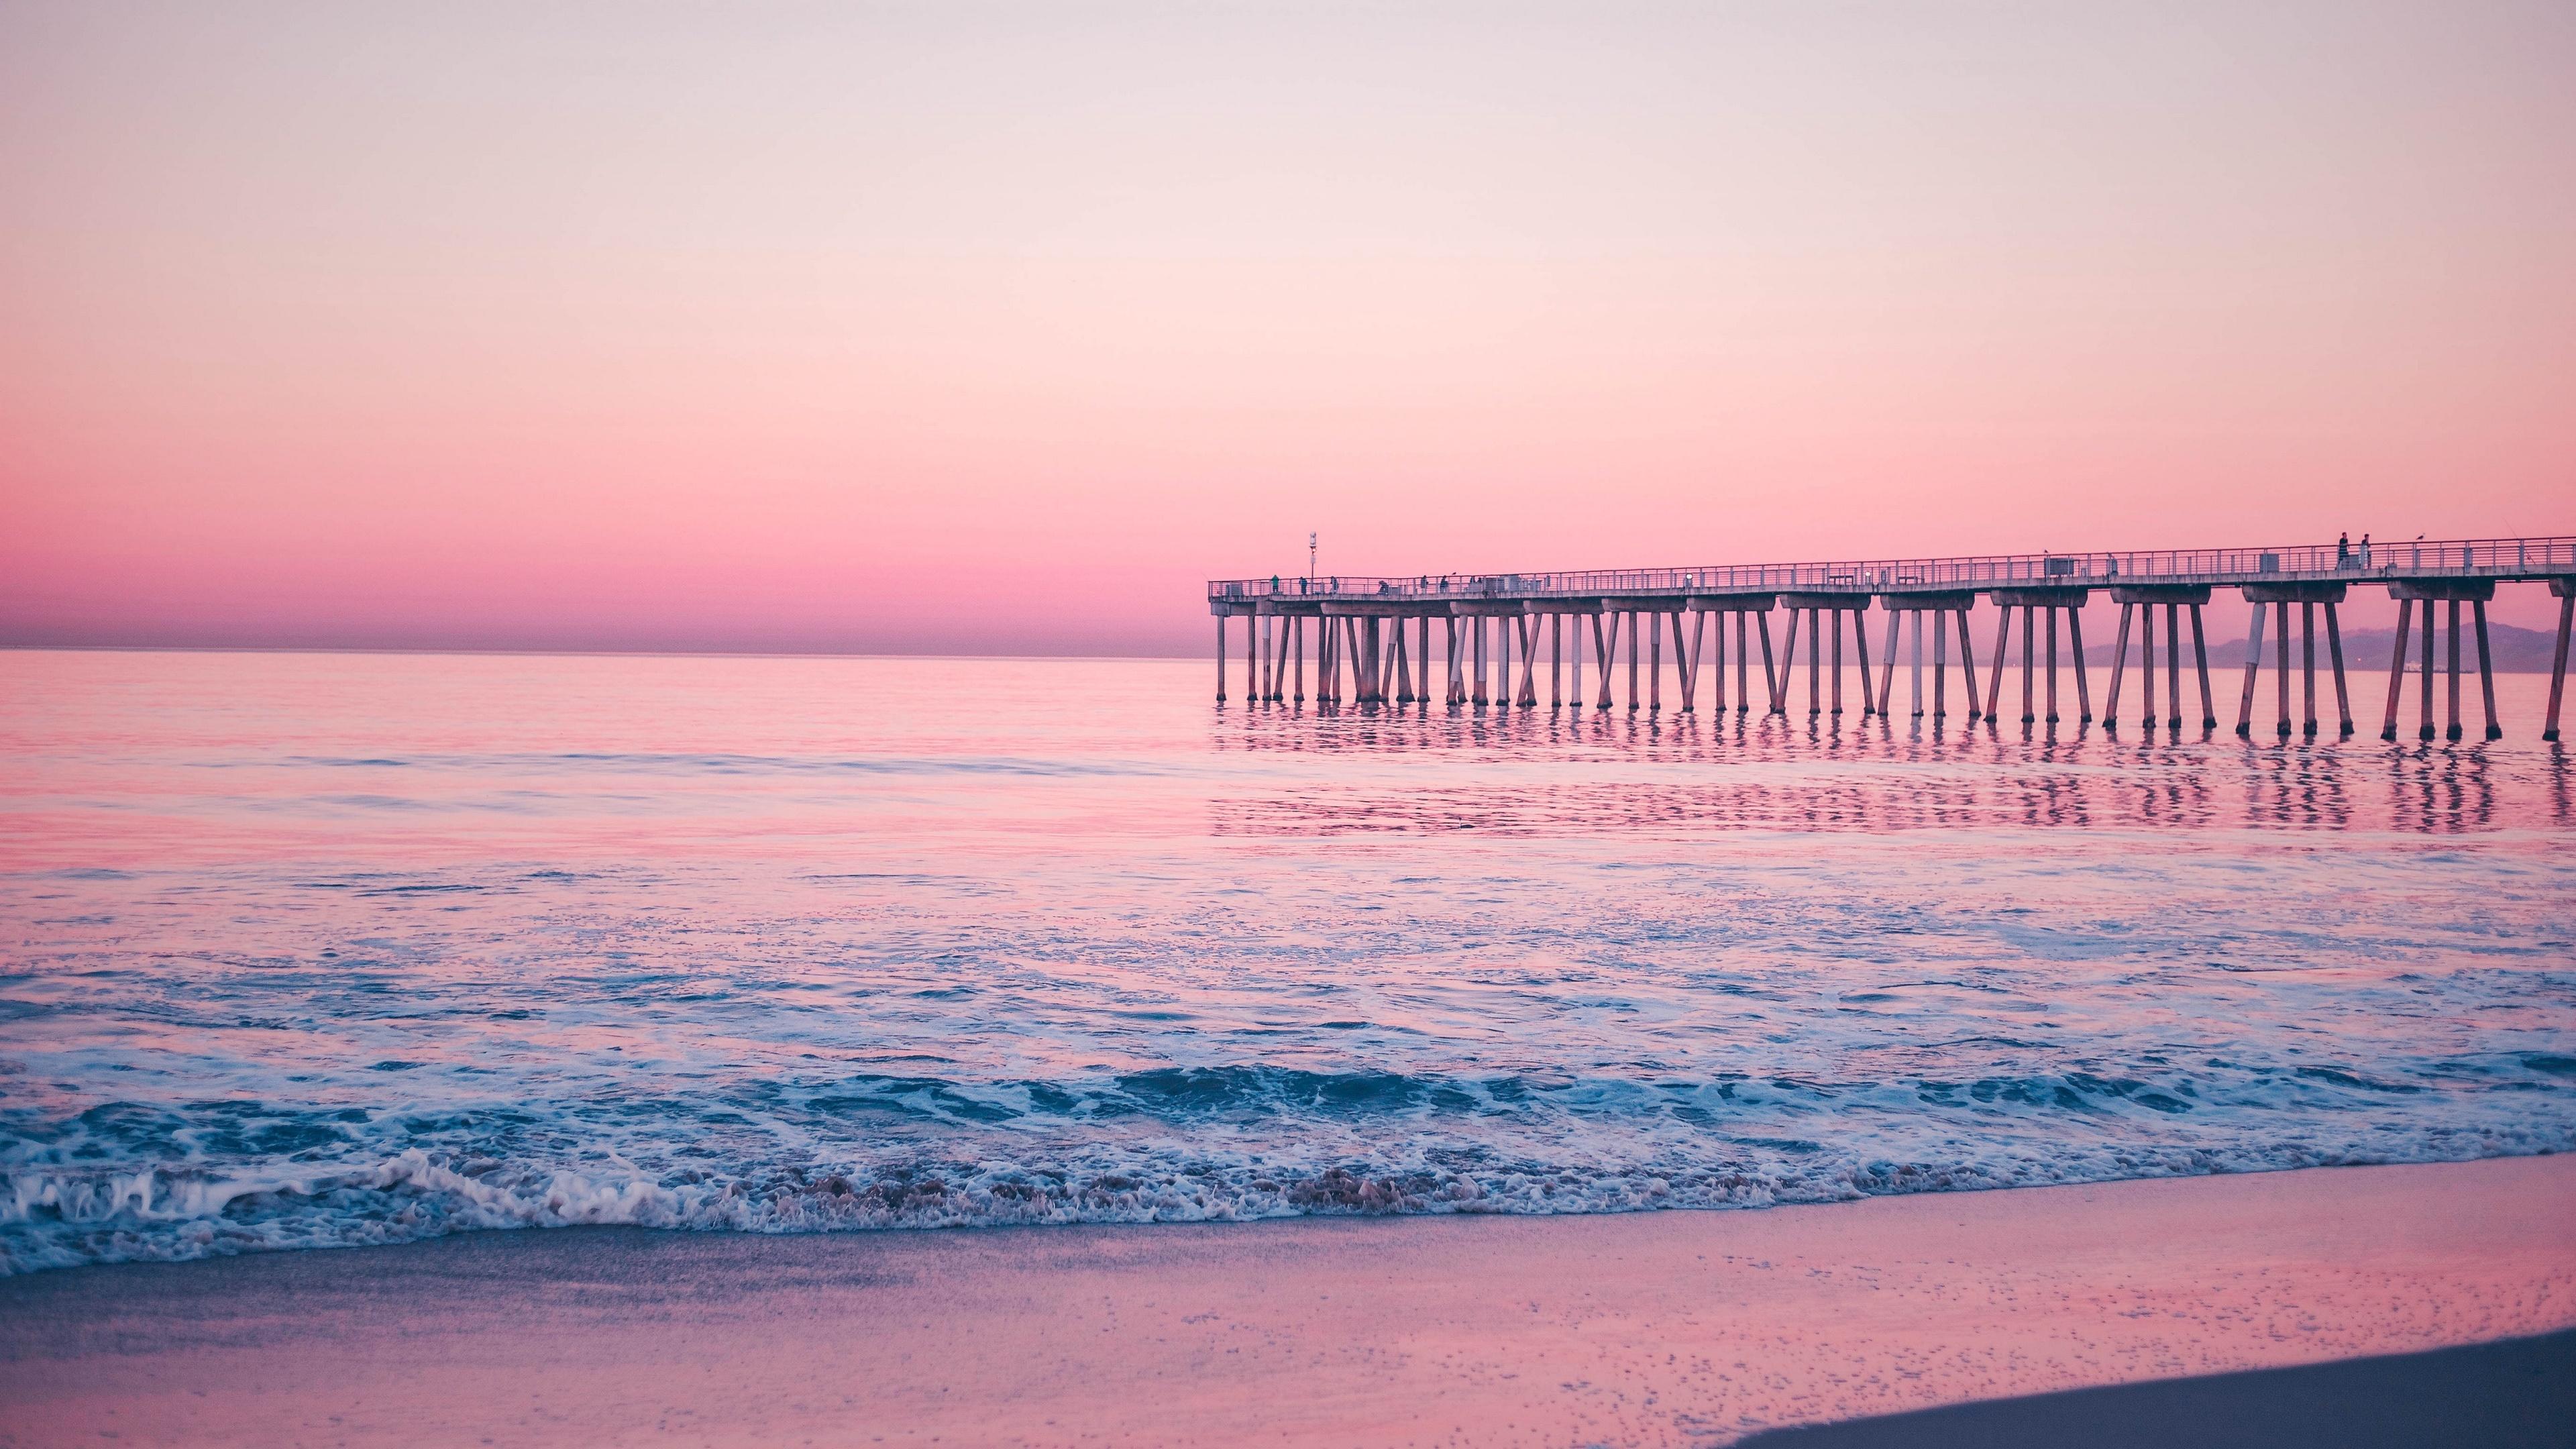 Hermosa Beach Pier (California) wallpaper